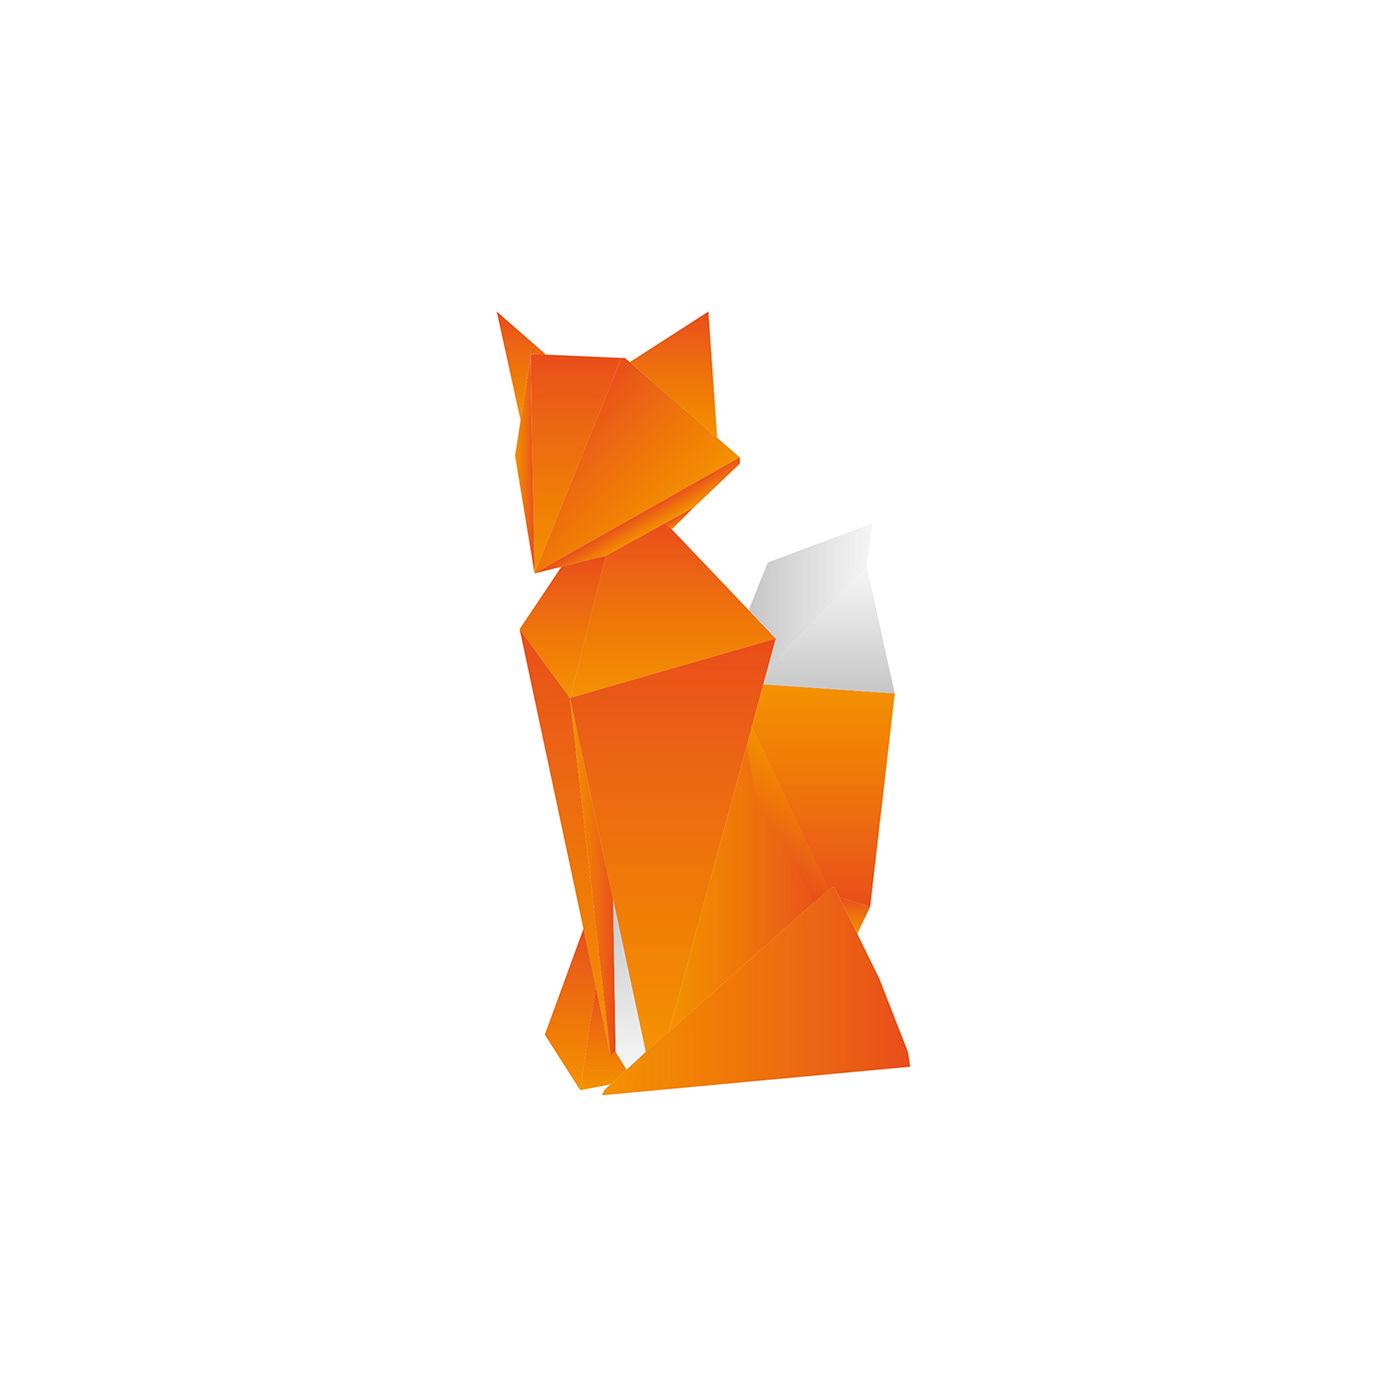 Origami Illustrations